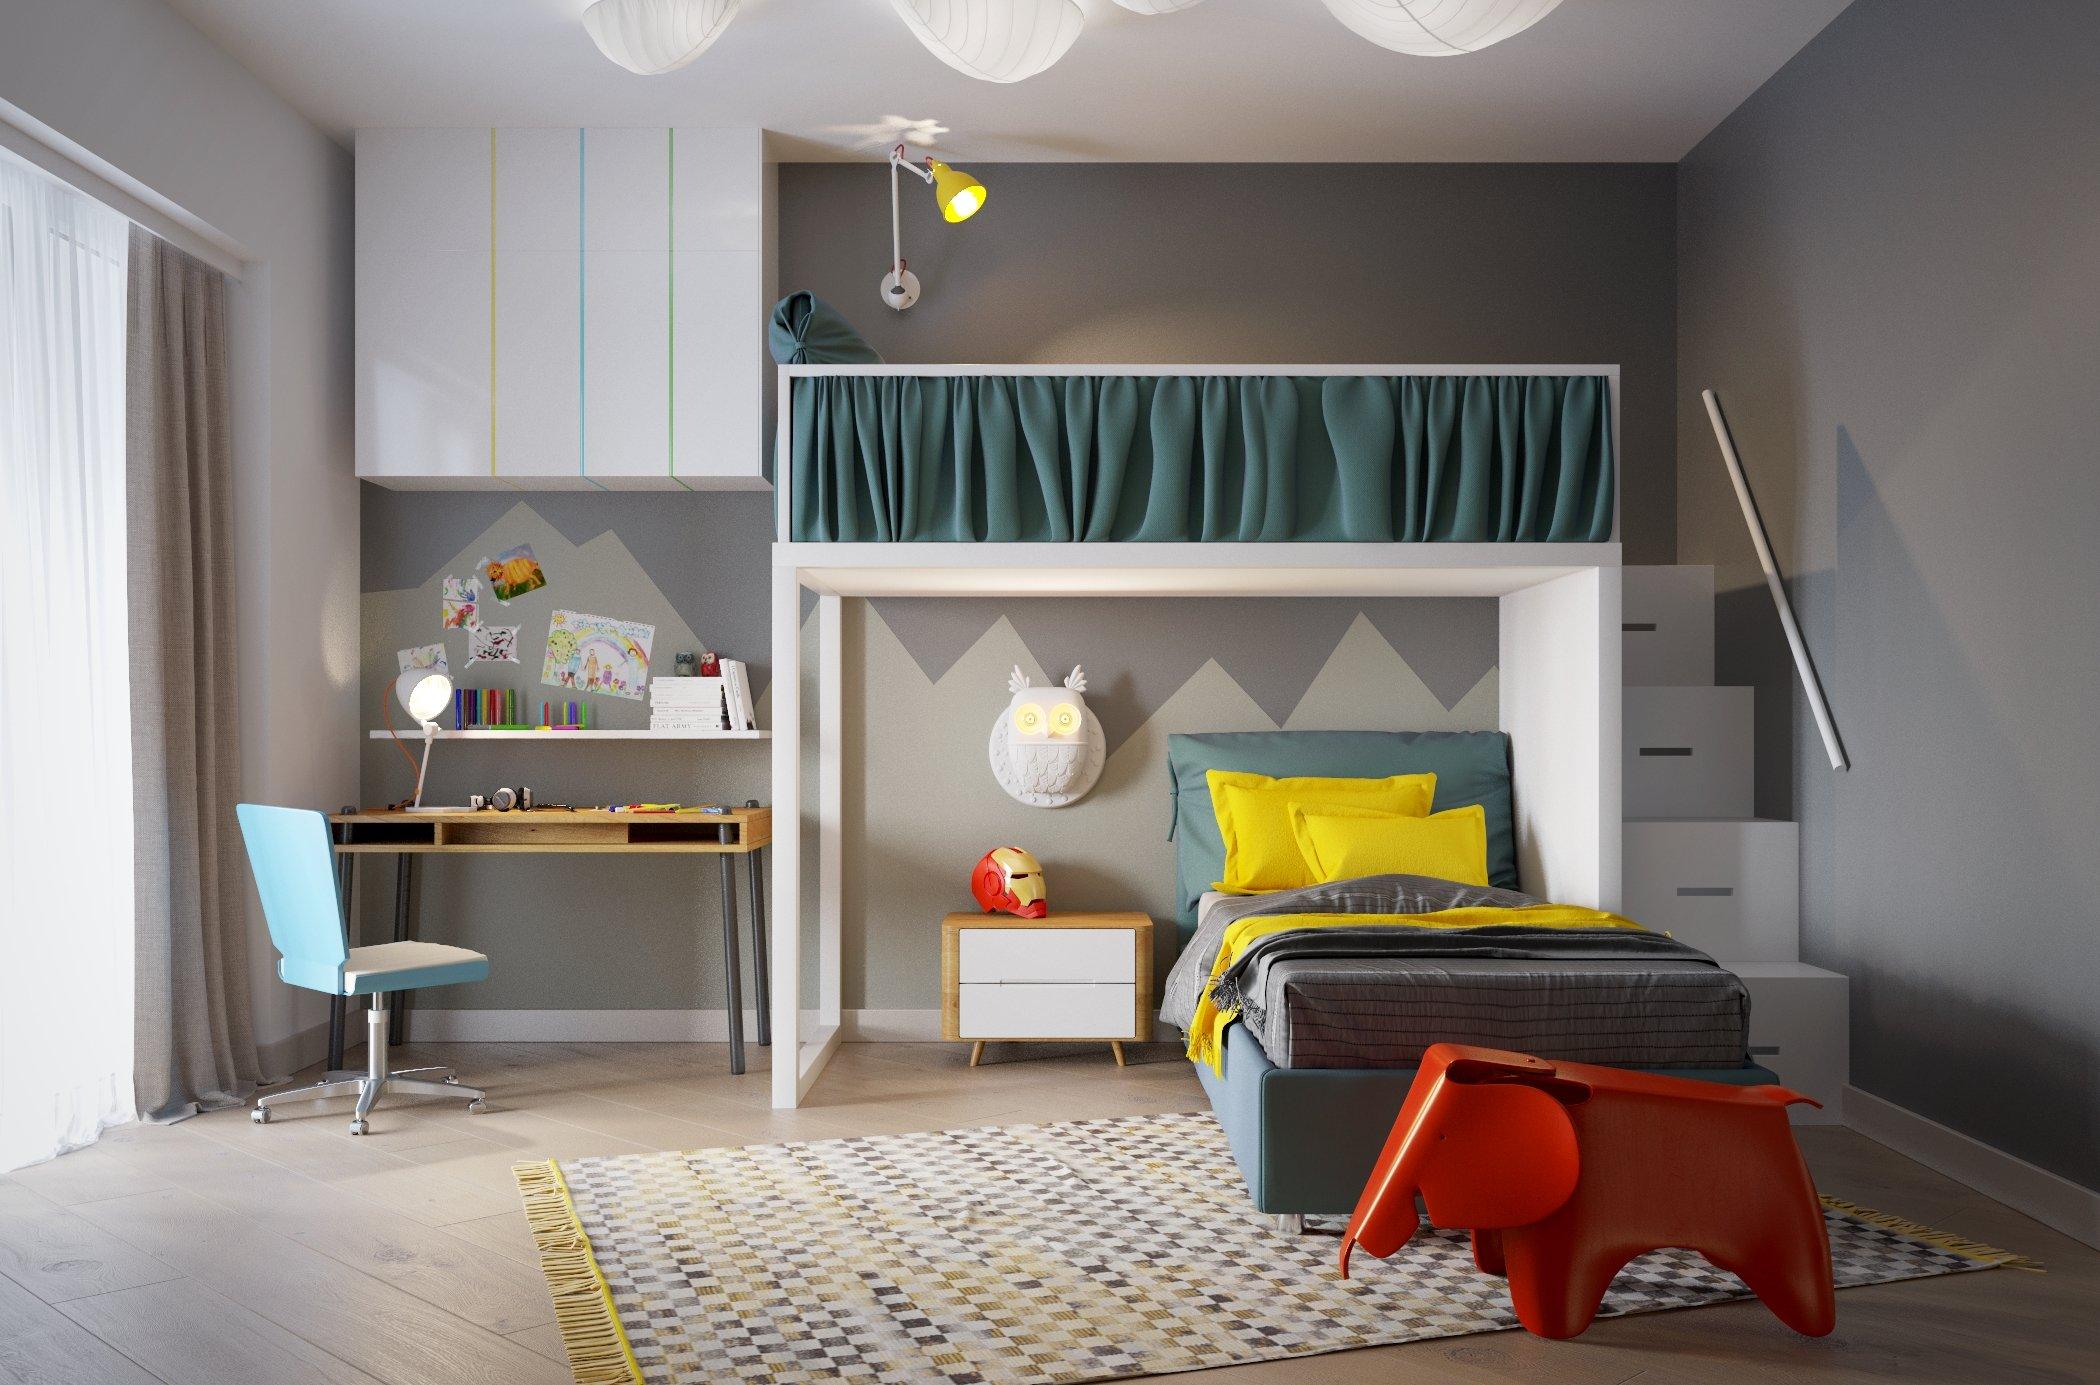 tivedo Lamps for children's bedrooms